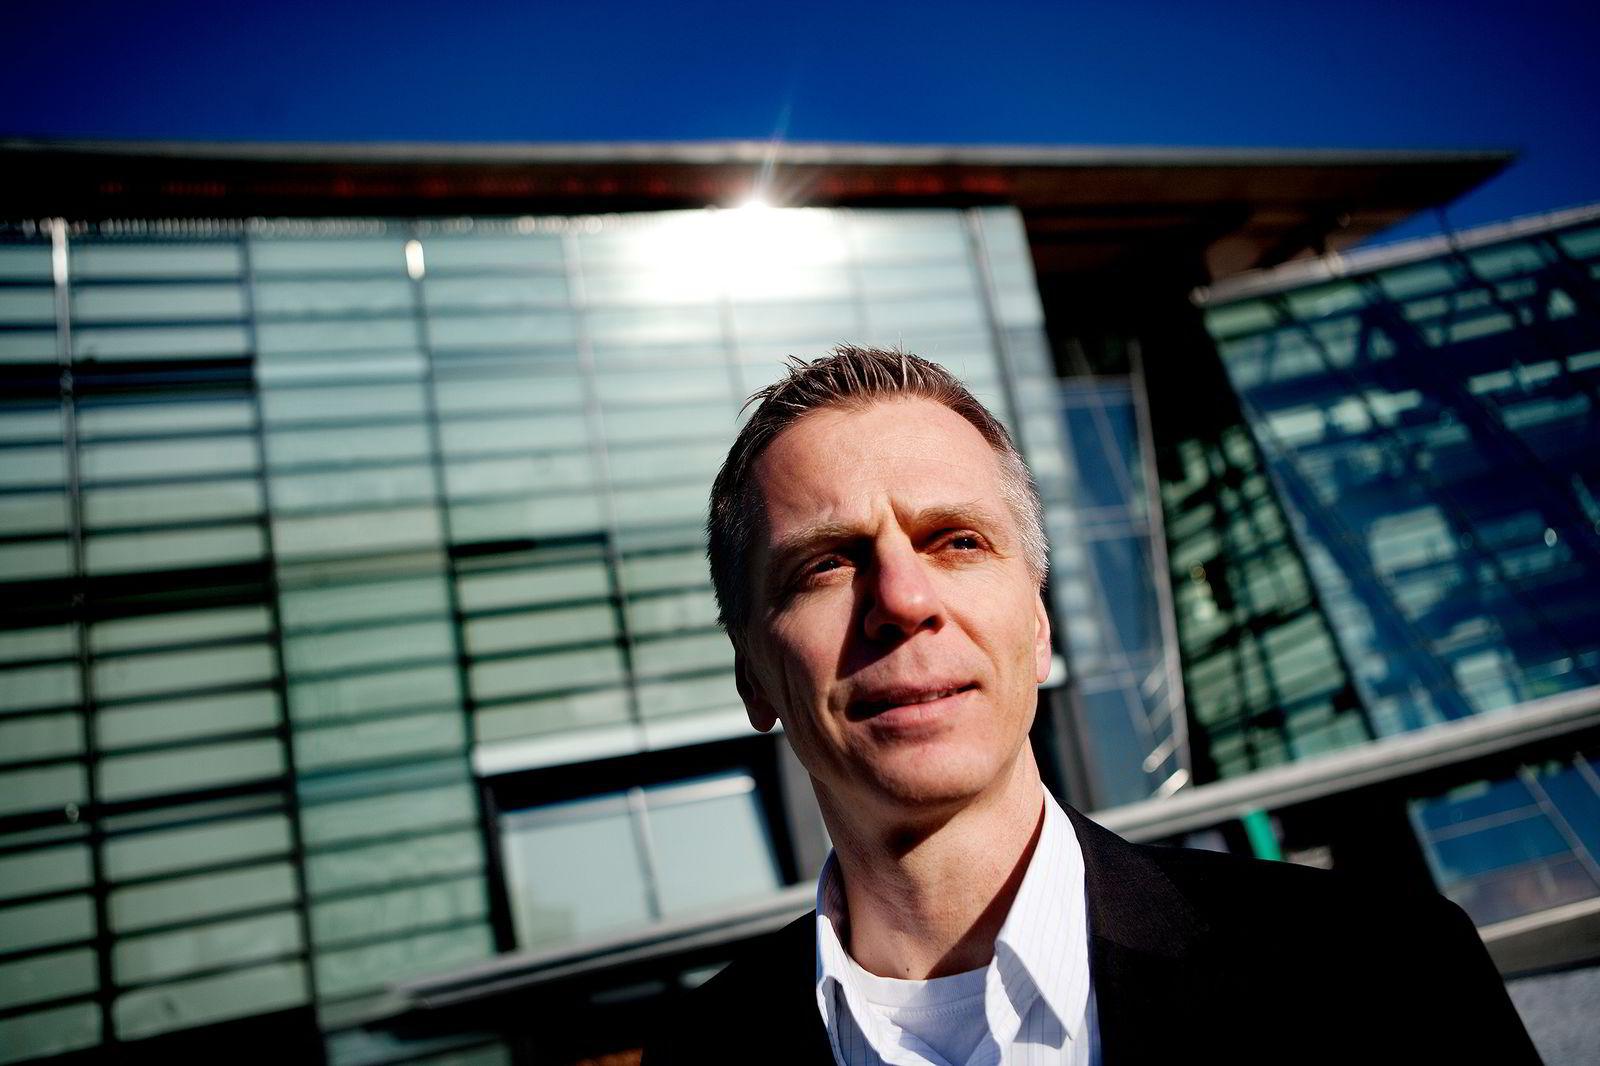 Ragnar Kårhus er direktør for Telenor Broadcast og Canal Digital.